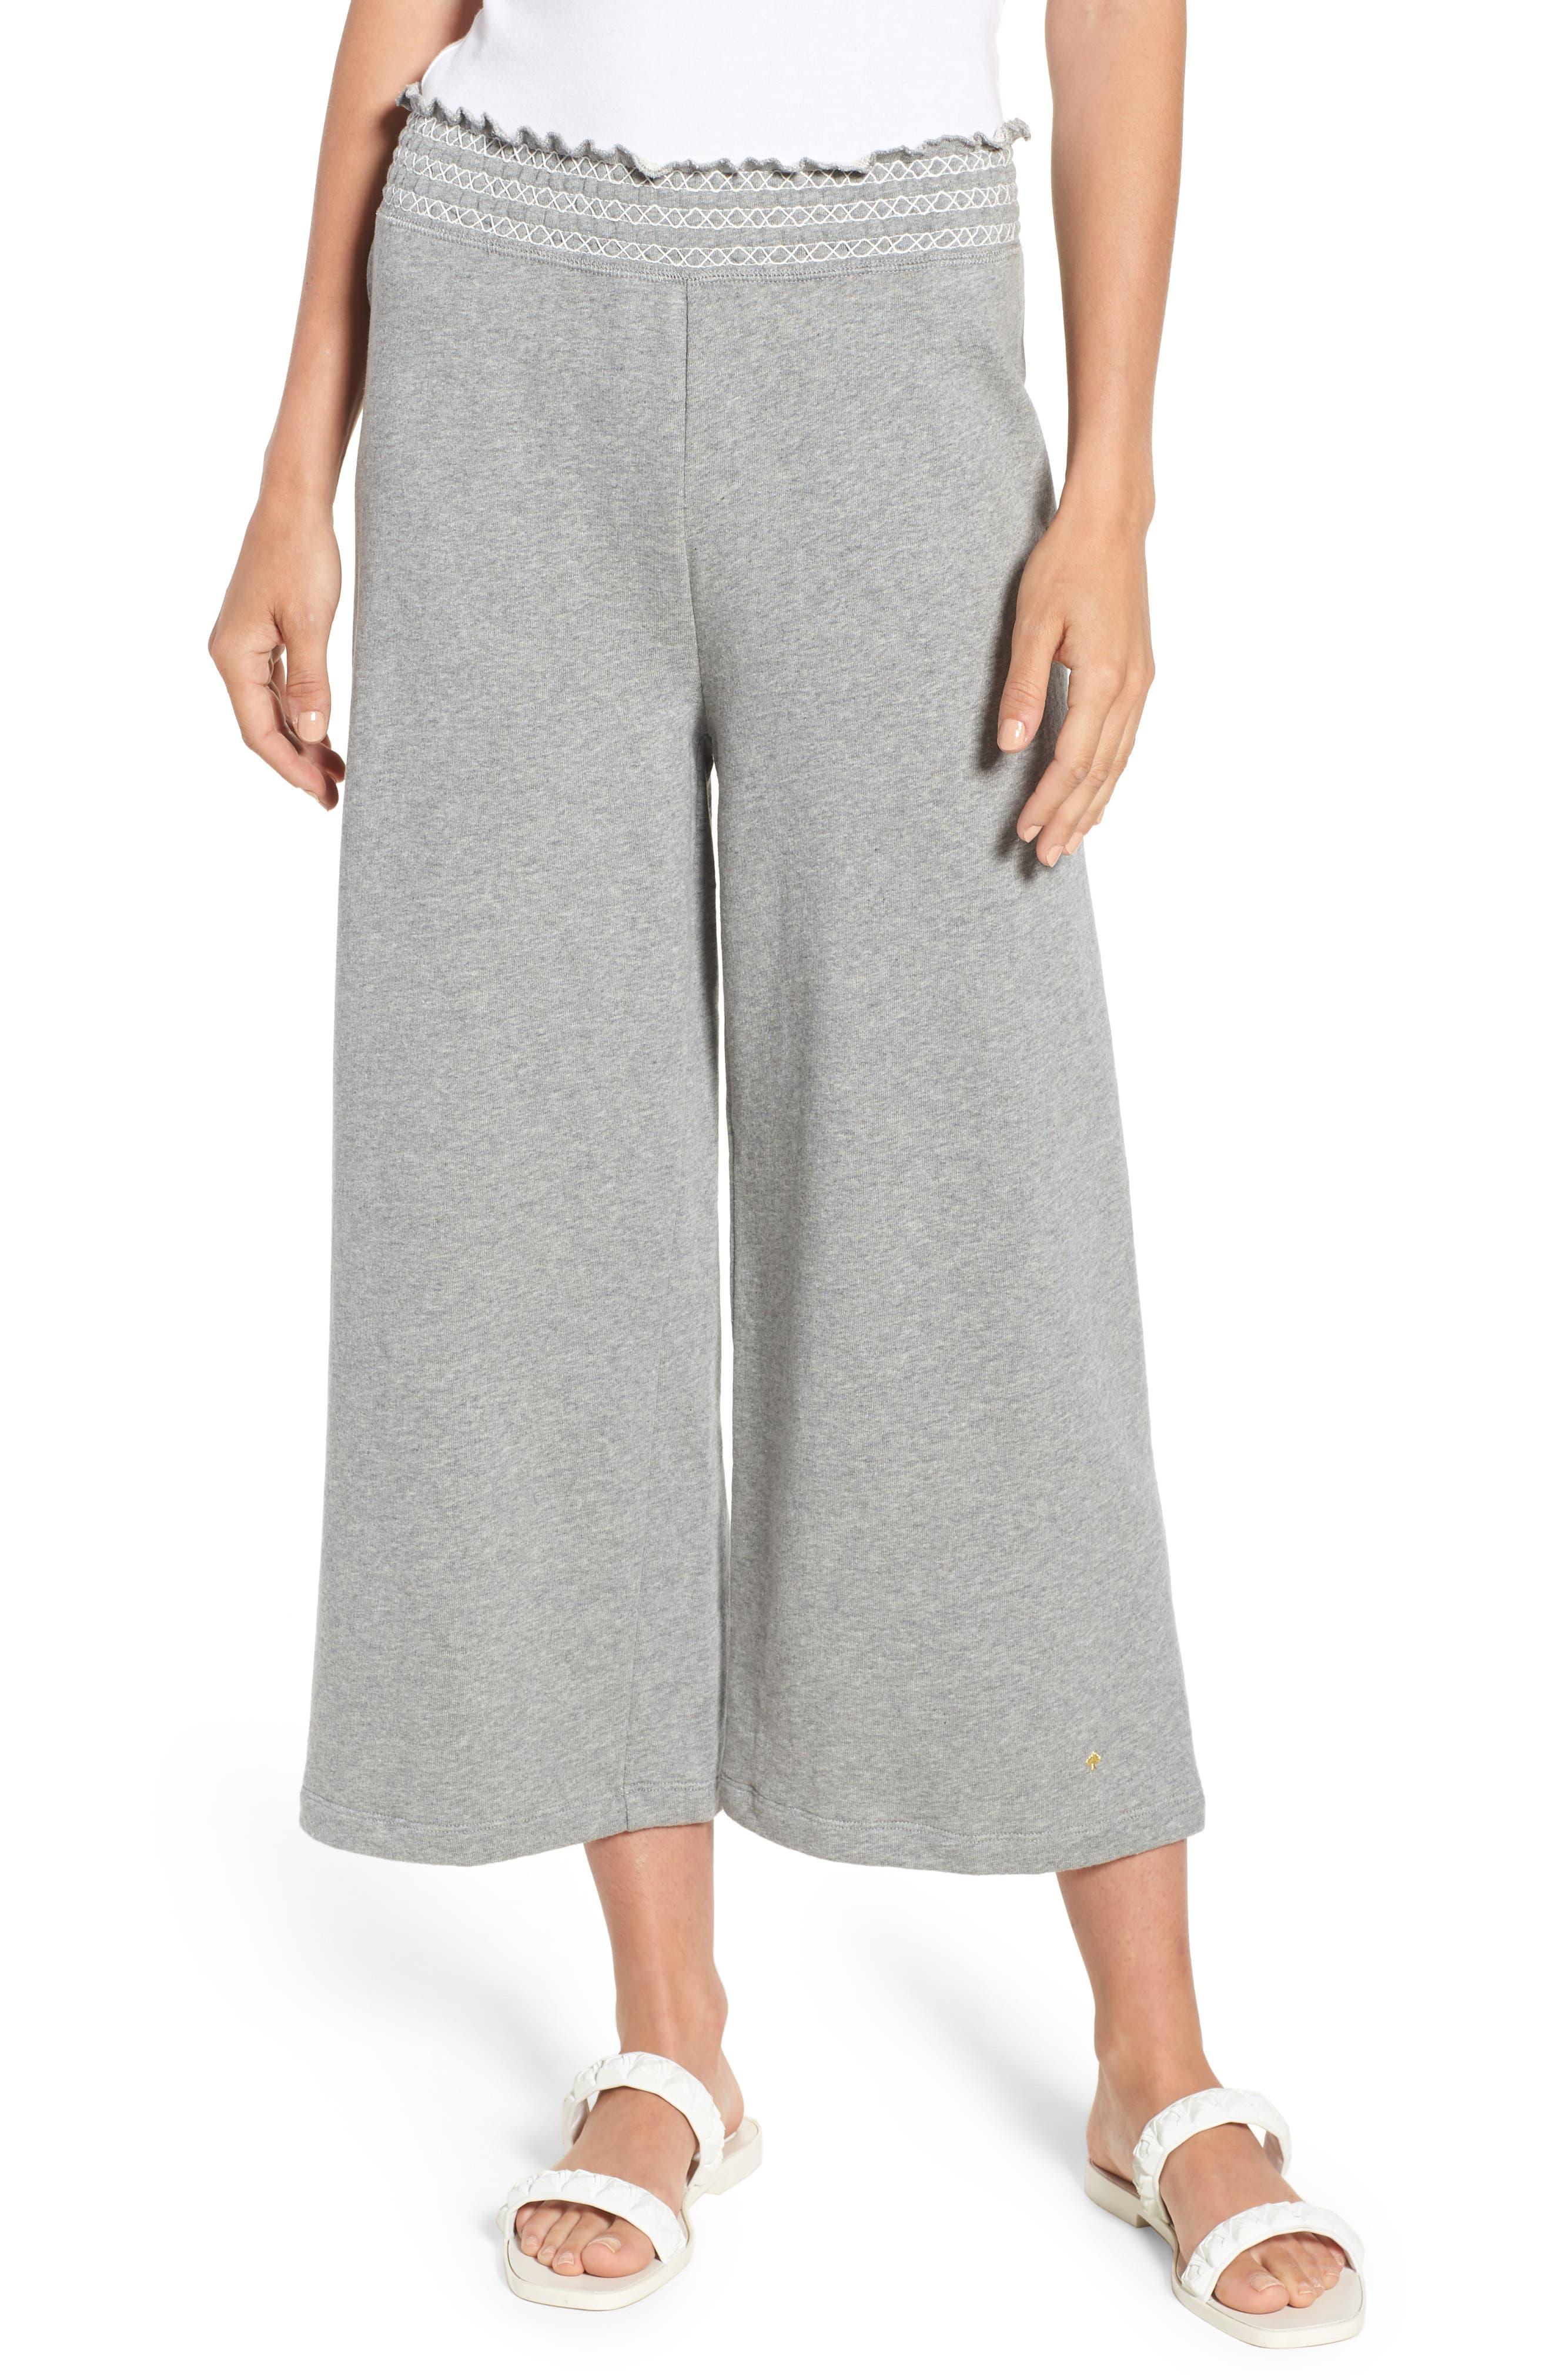 KATE SPADE NEW YORK,                             smocked wide leg crop sweatpants,                             Main thumbnail 1, color,                             088